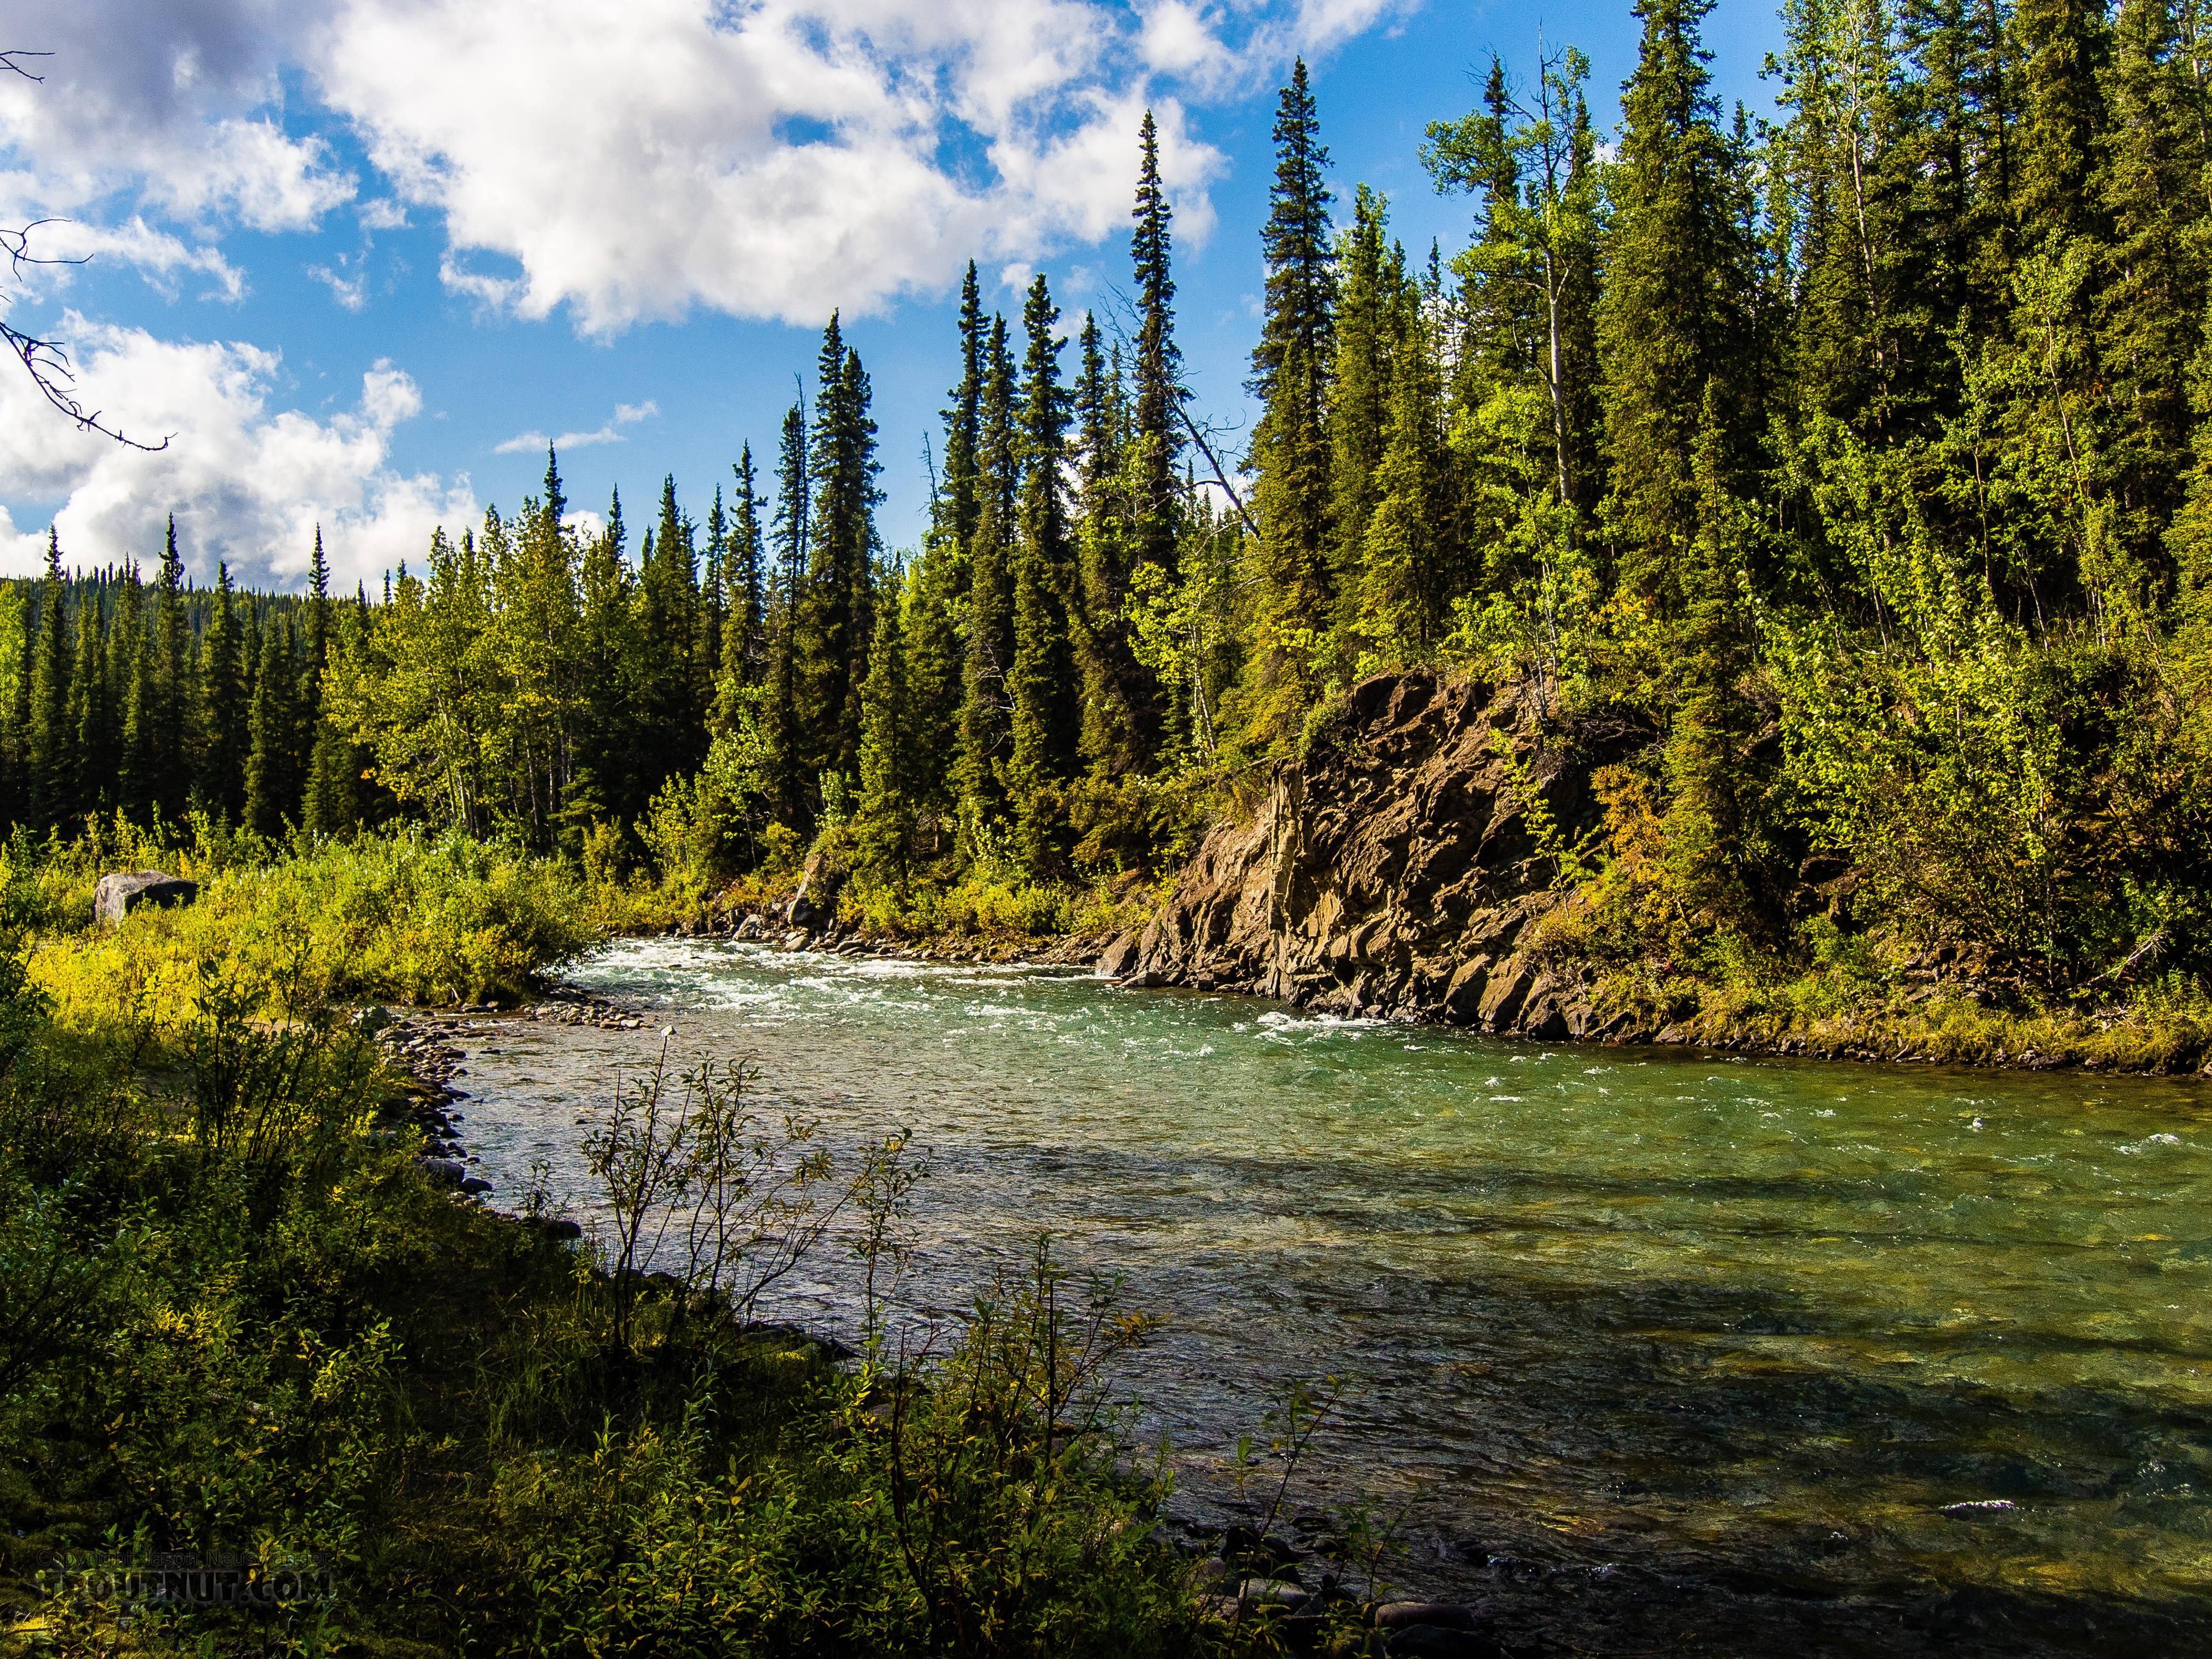 From Riley Creek in Alaska.